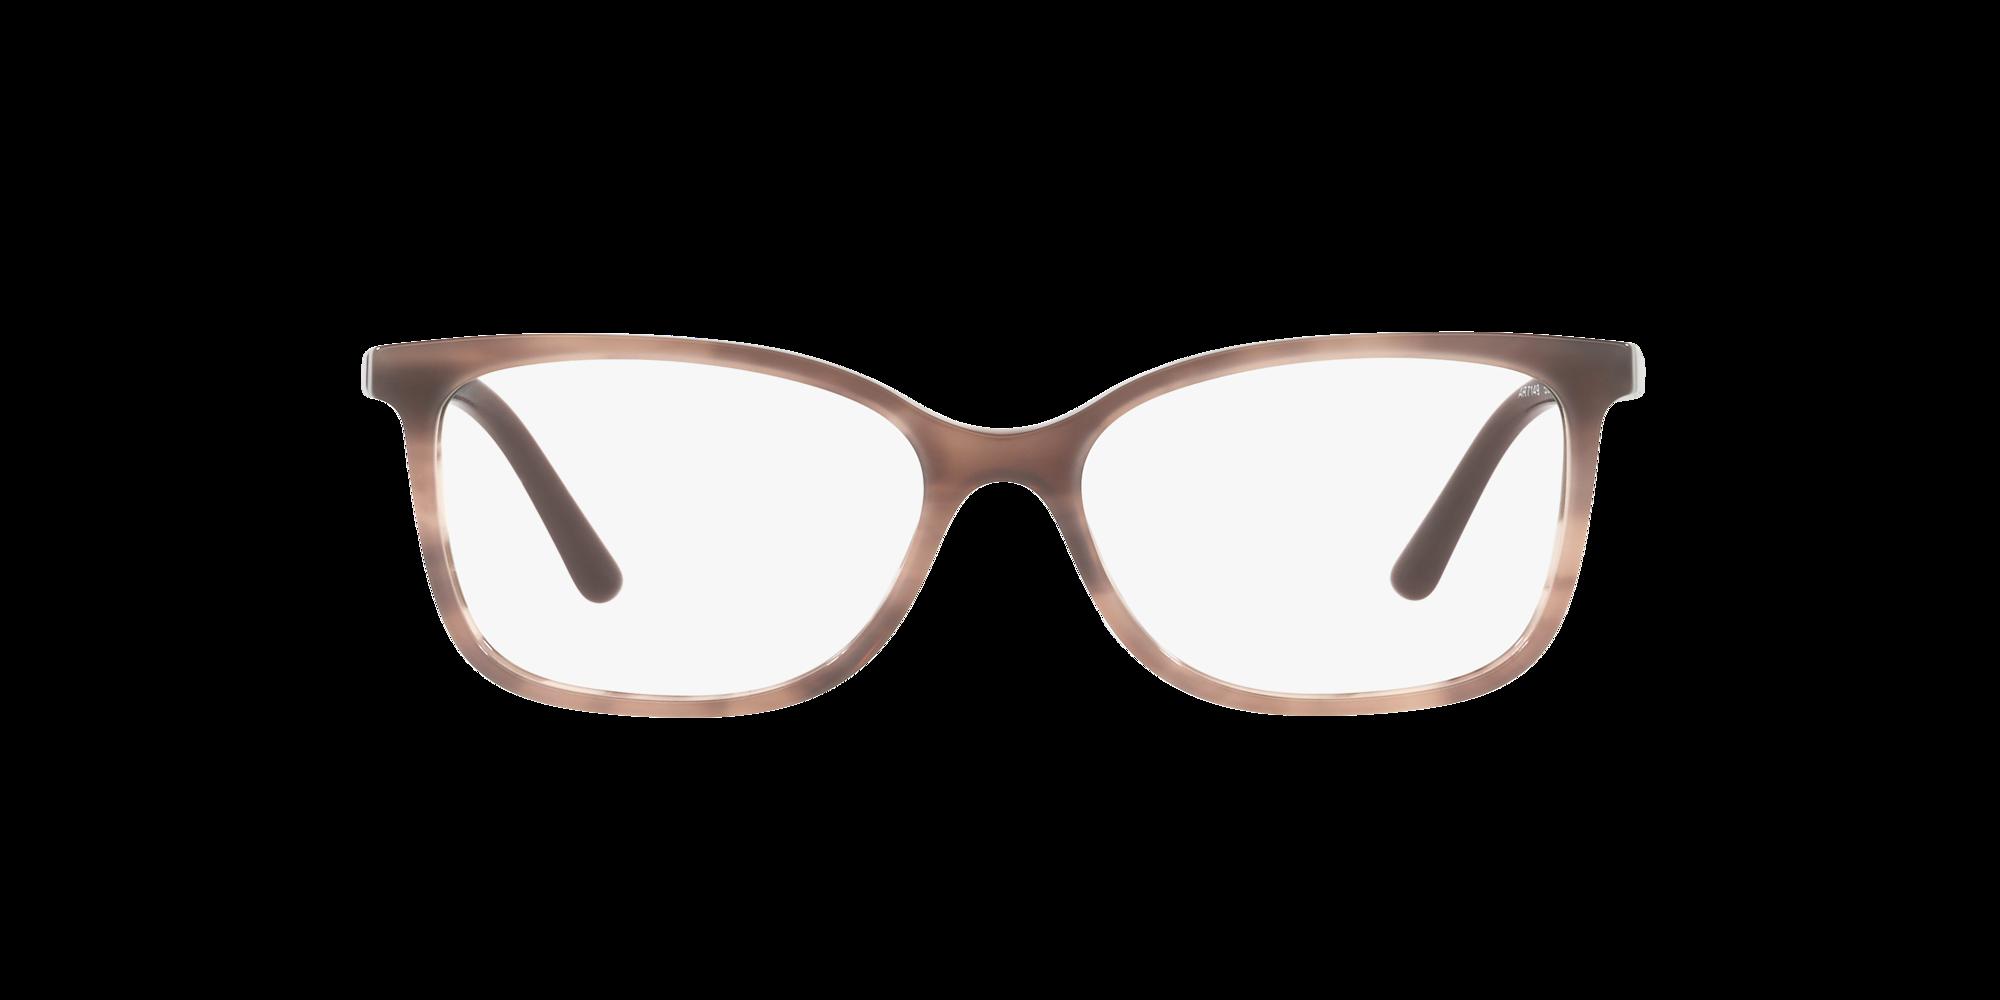 Image for AR7149 from LensCrafters | Glasses, Prescription Glasses Online, Eyewear